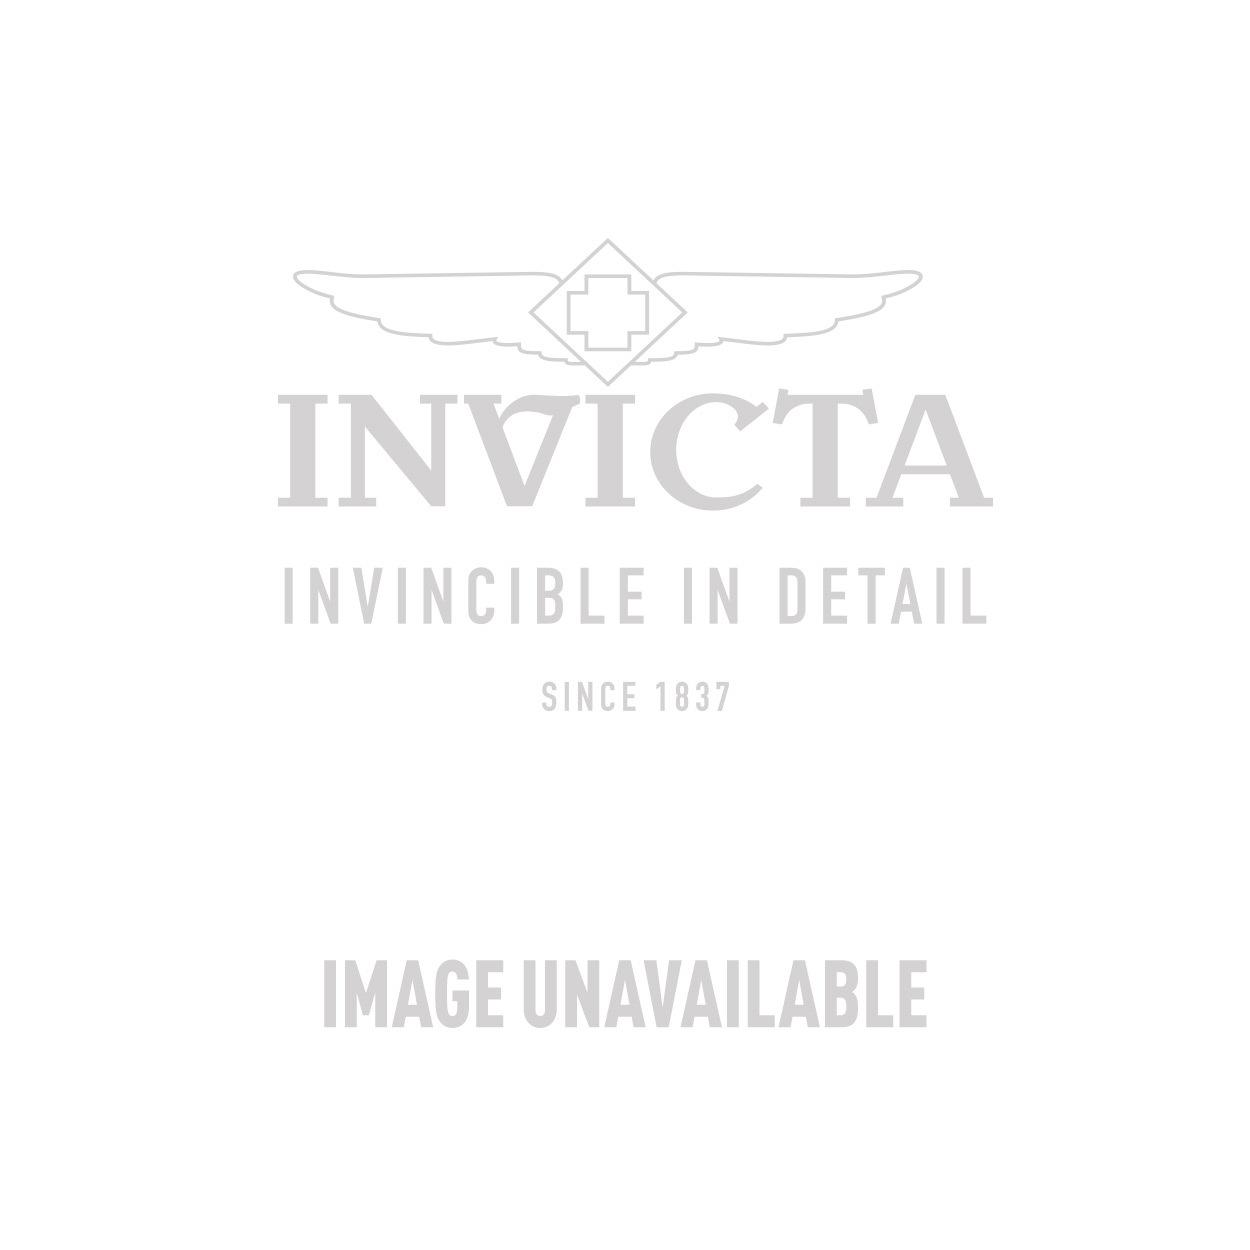 Invicta Pro Diver Quartz Watch - Gold, Stainless Steel case with Steel, Gold tone Stainless Steel band - Model 8942